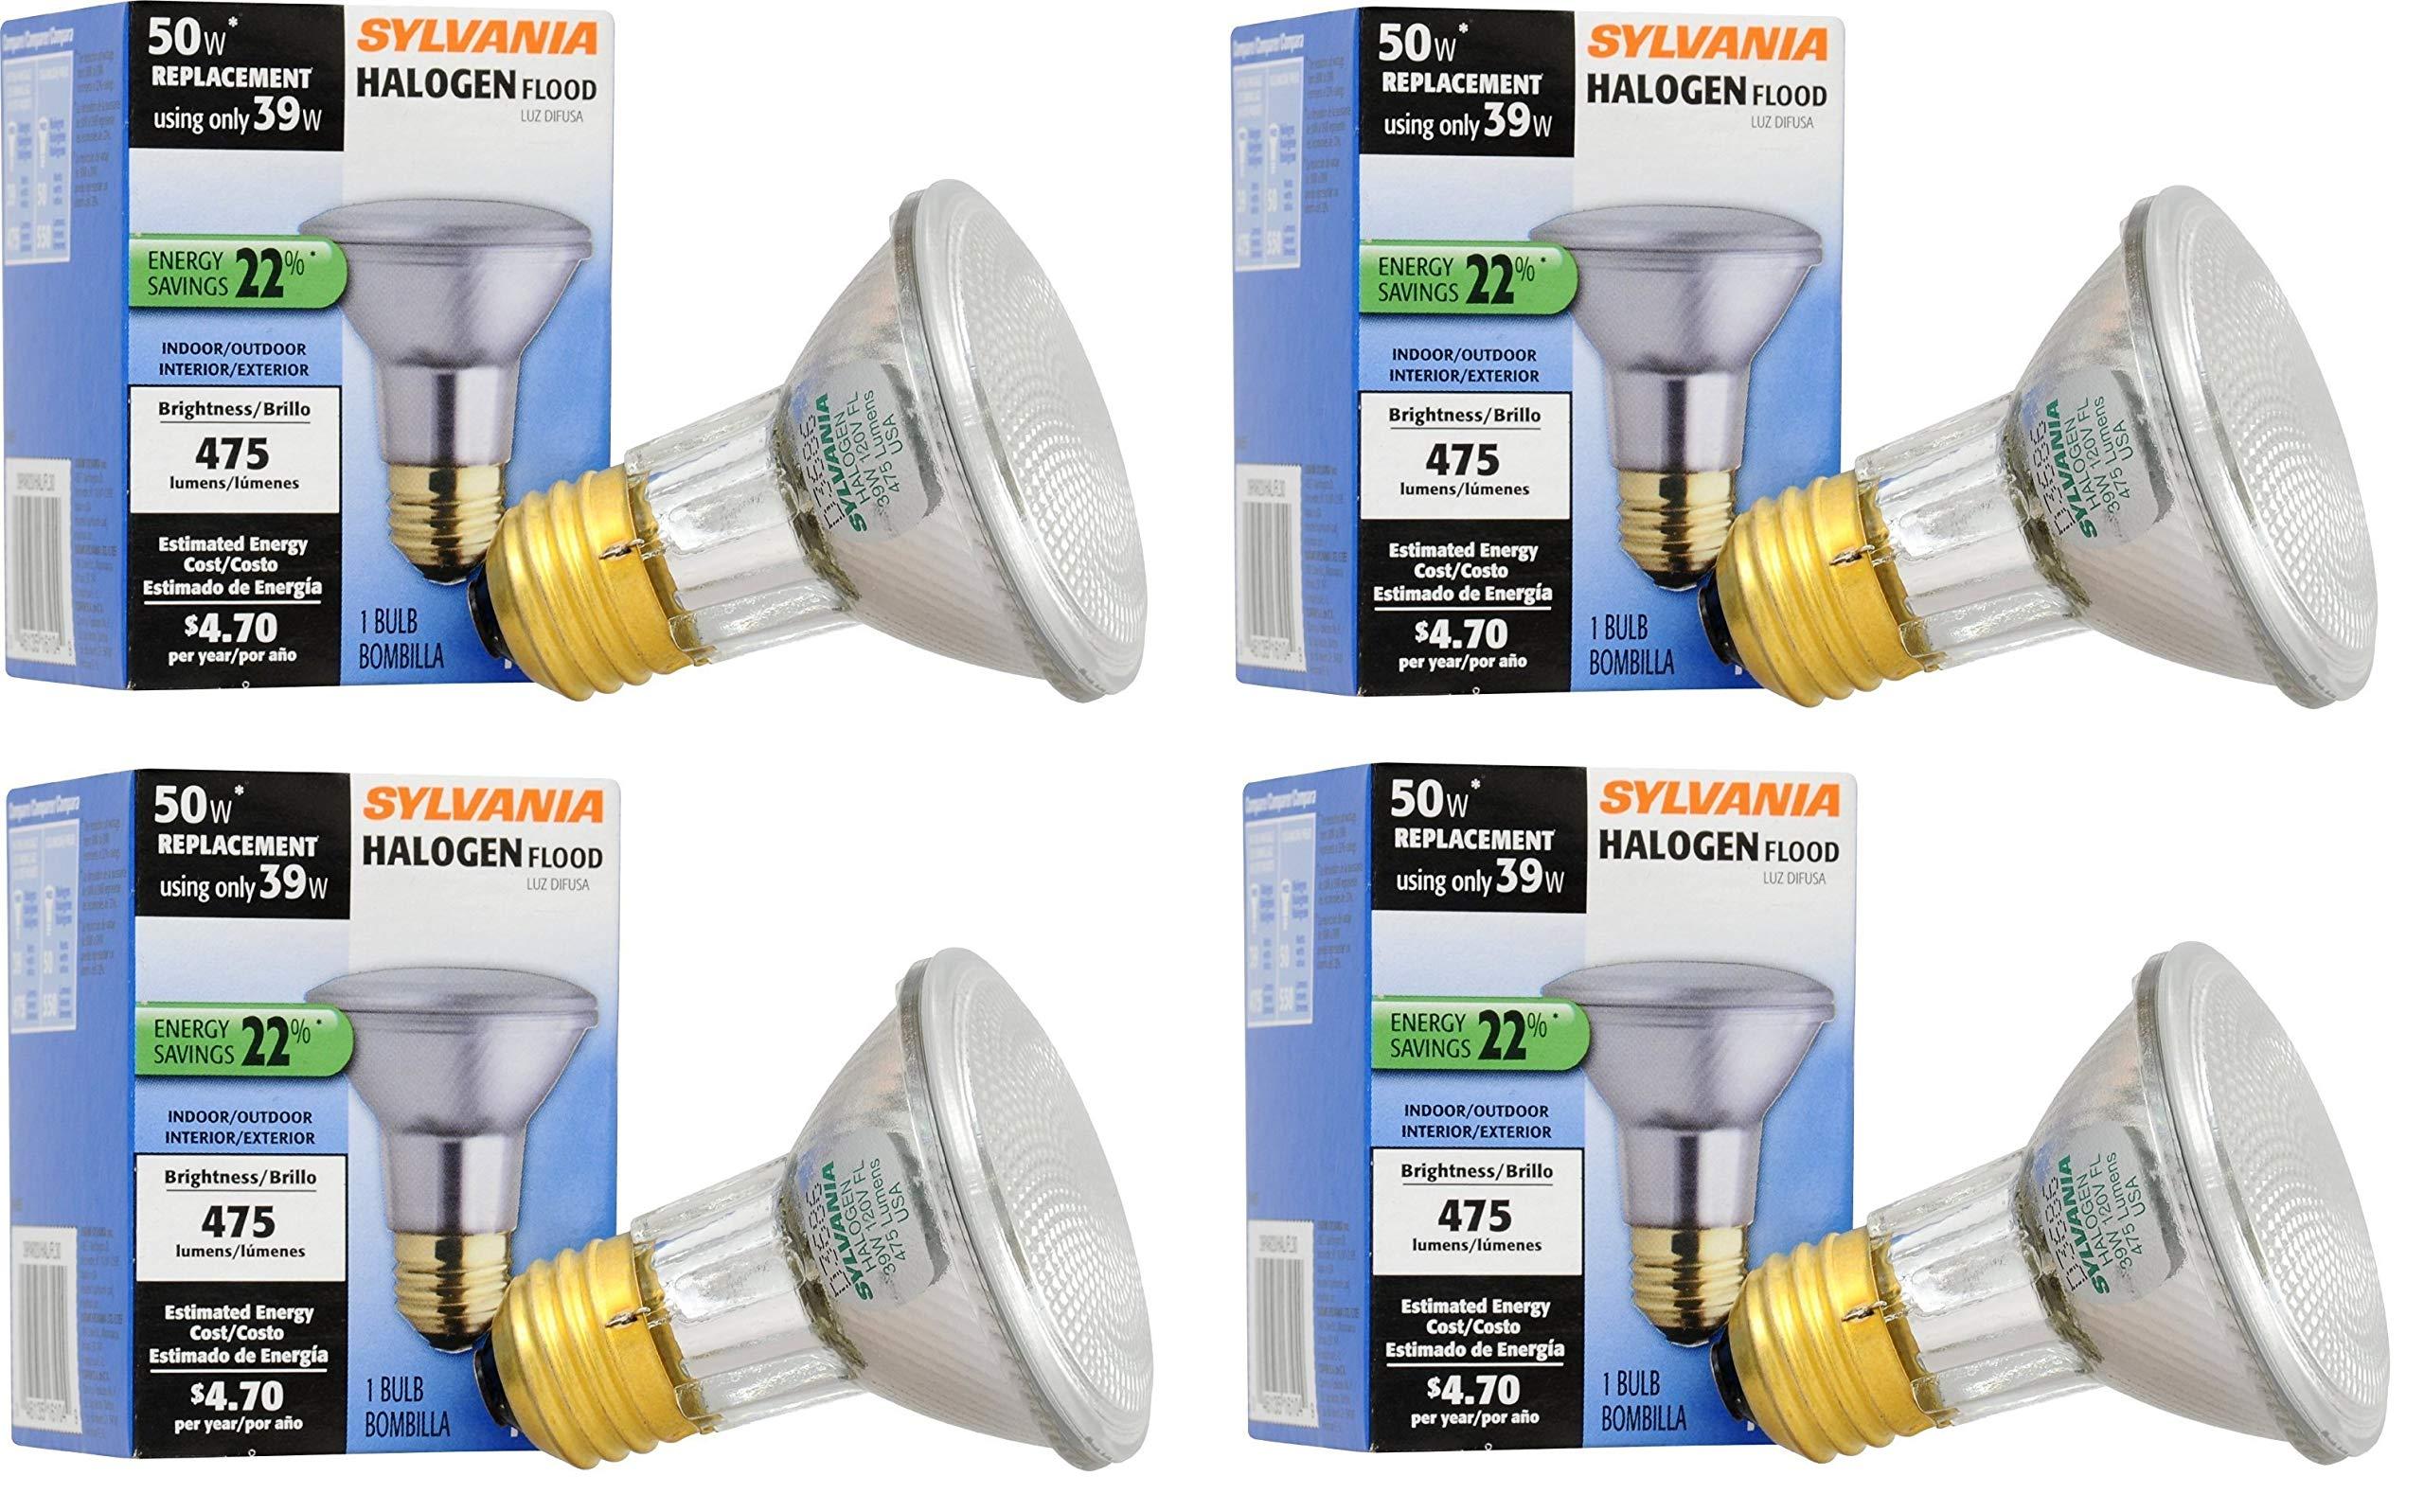 SYLVANIA 4 Pack Capsylite Halogen Dimmable Lamp/PAR20 Flood Light Reflector/50W Replacement/Medium Base E26/39 Watt/2850 K - Warm White (4 Pack)